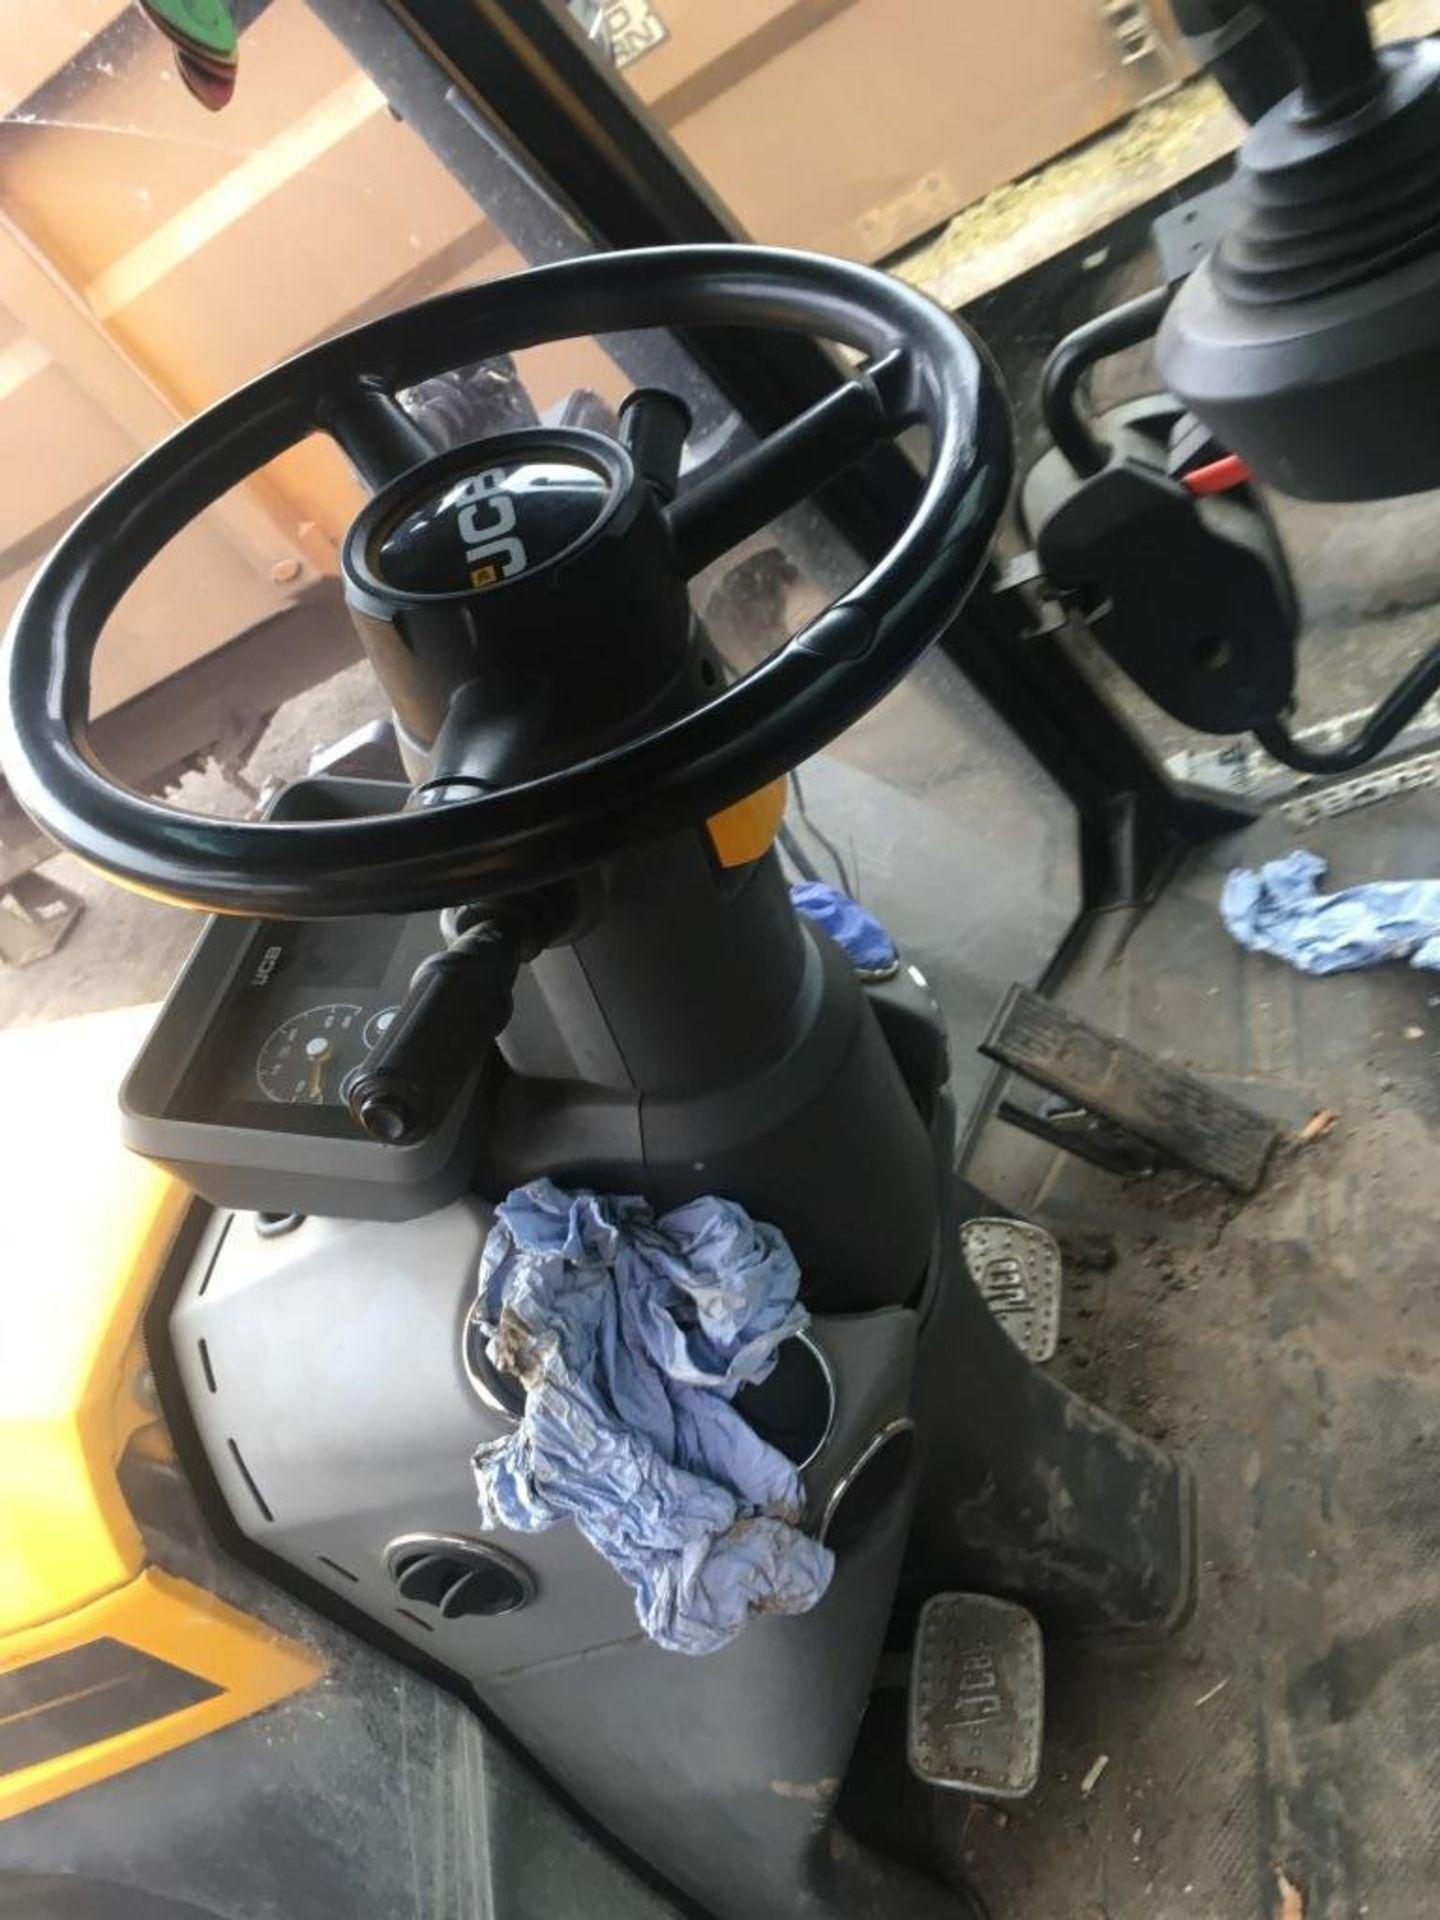 Lot 3 - JCB 4220 Fastrac tractor, YOM: 2017, Reg: AY66 WRC, No. JCB43X60LG2184716, 5,008 hours, with Quicke